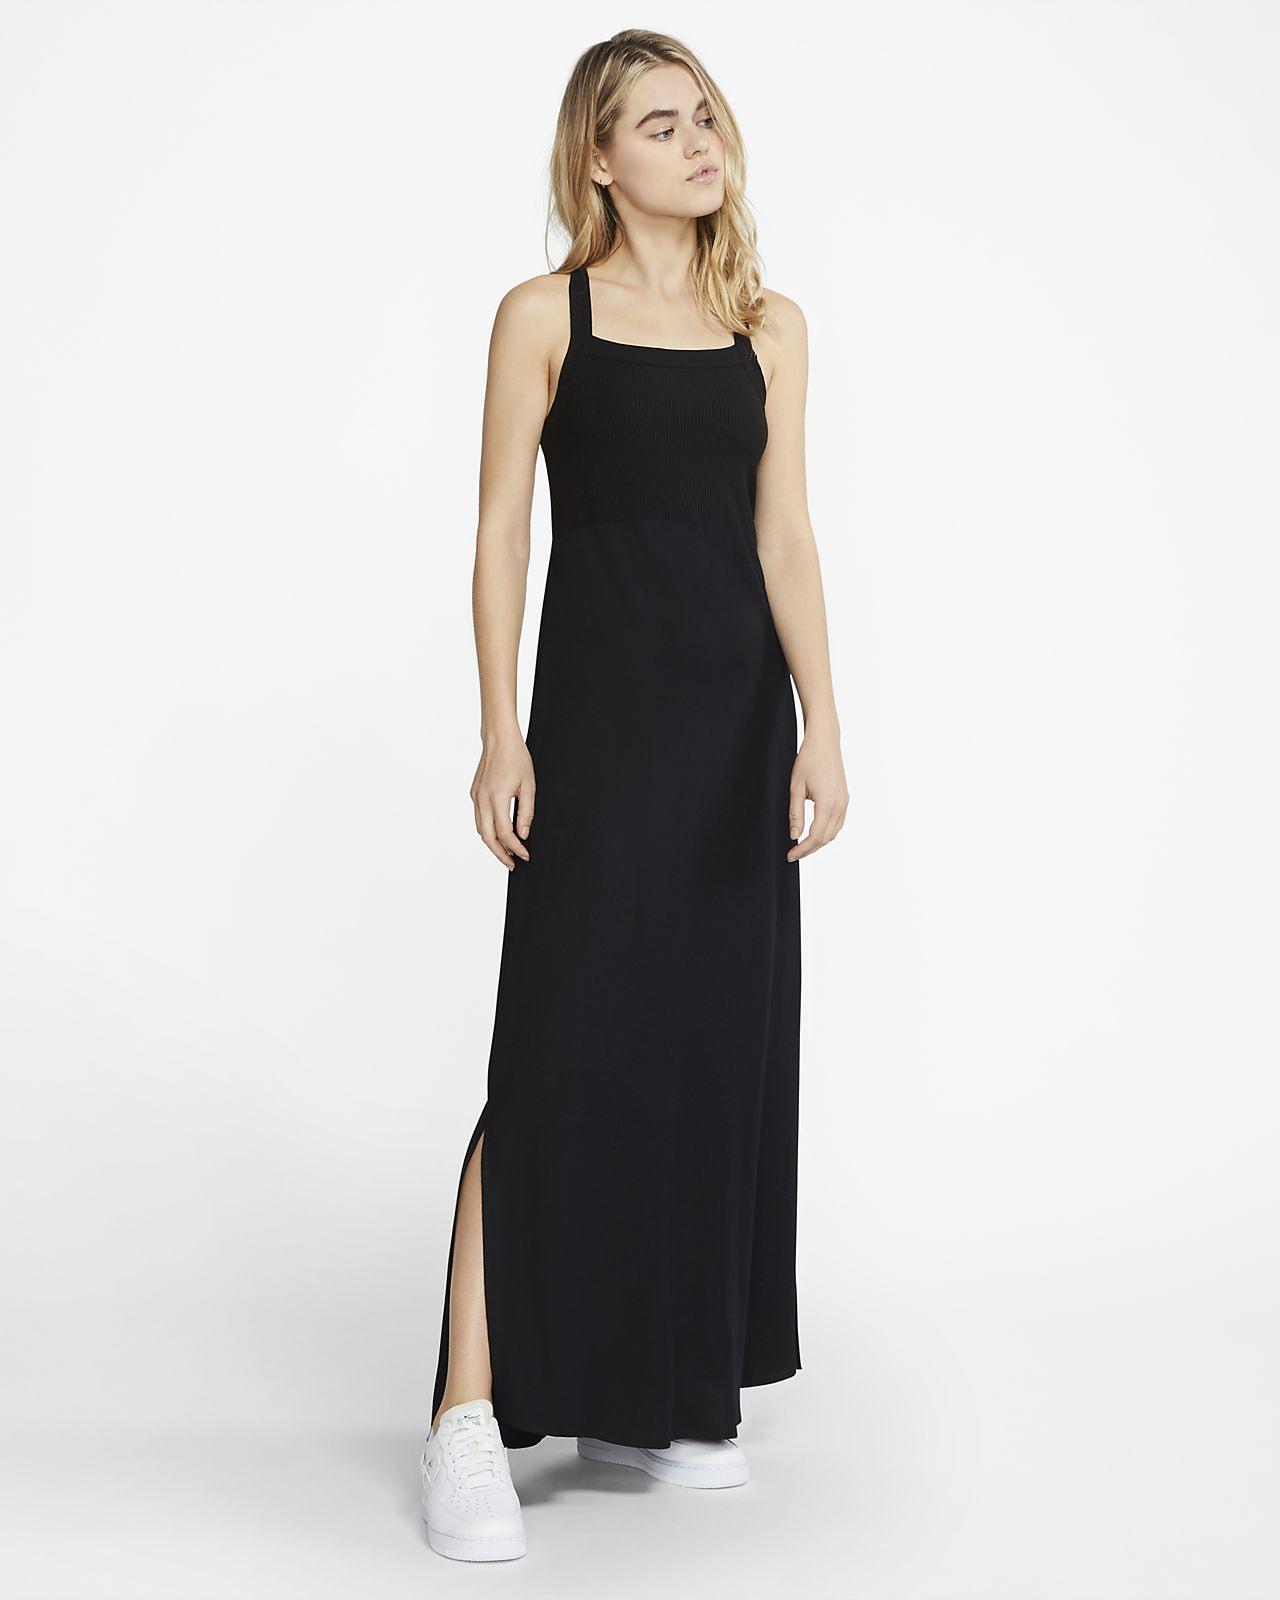 13 Luxurius Damenkleid Ärmel10 Genial Damenkleid Spezialgebiet